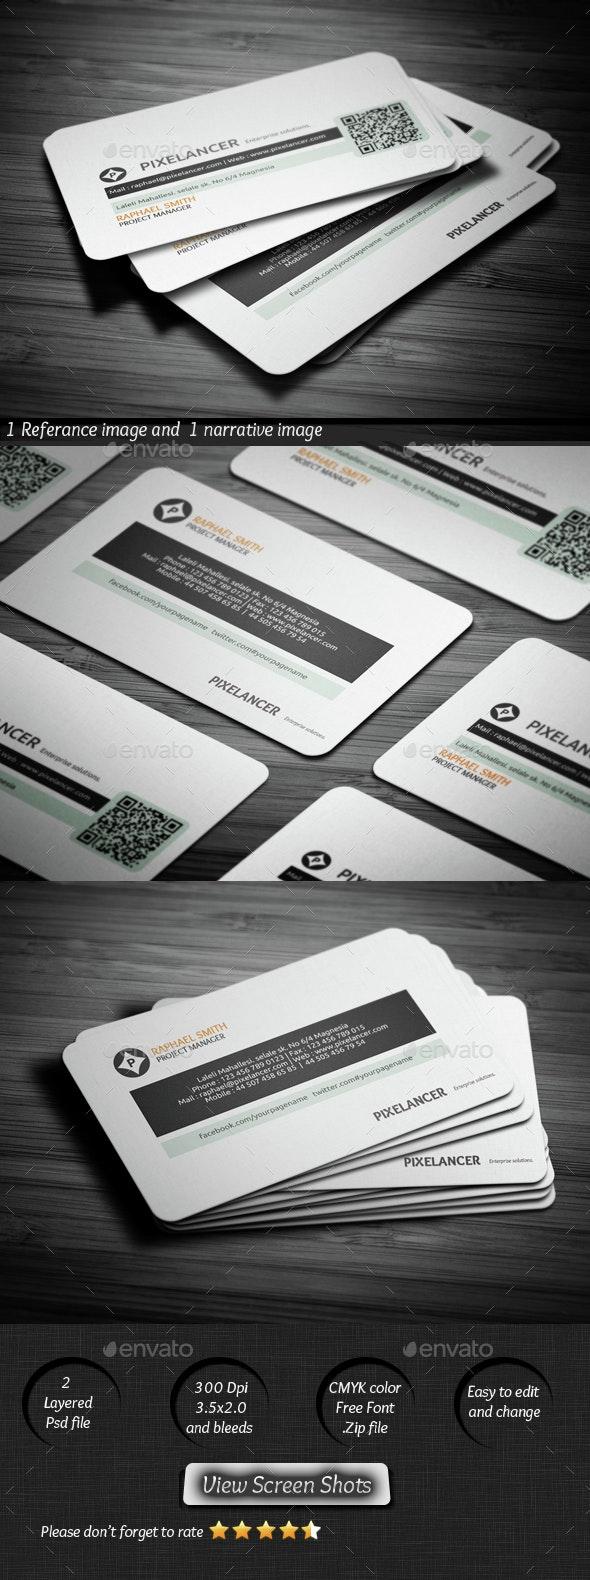 Pixelancer Business Card - Corporate Business Cards